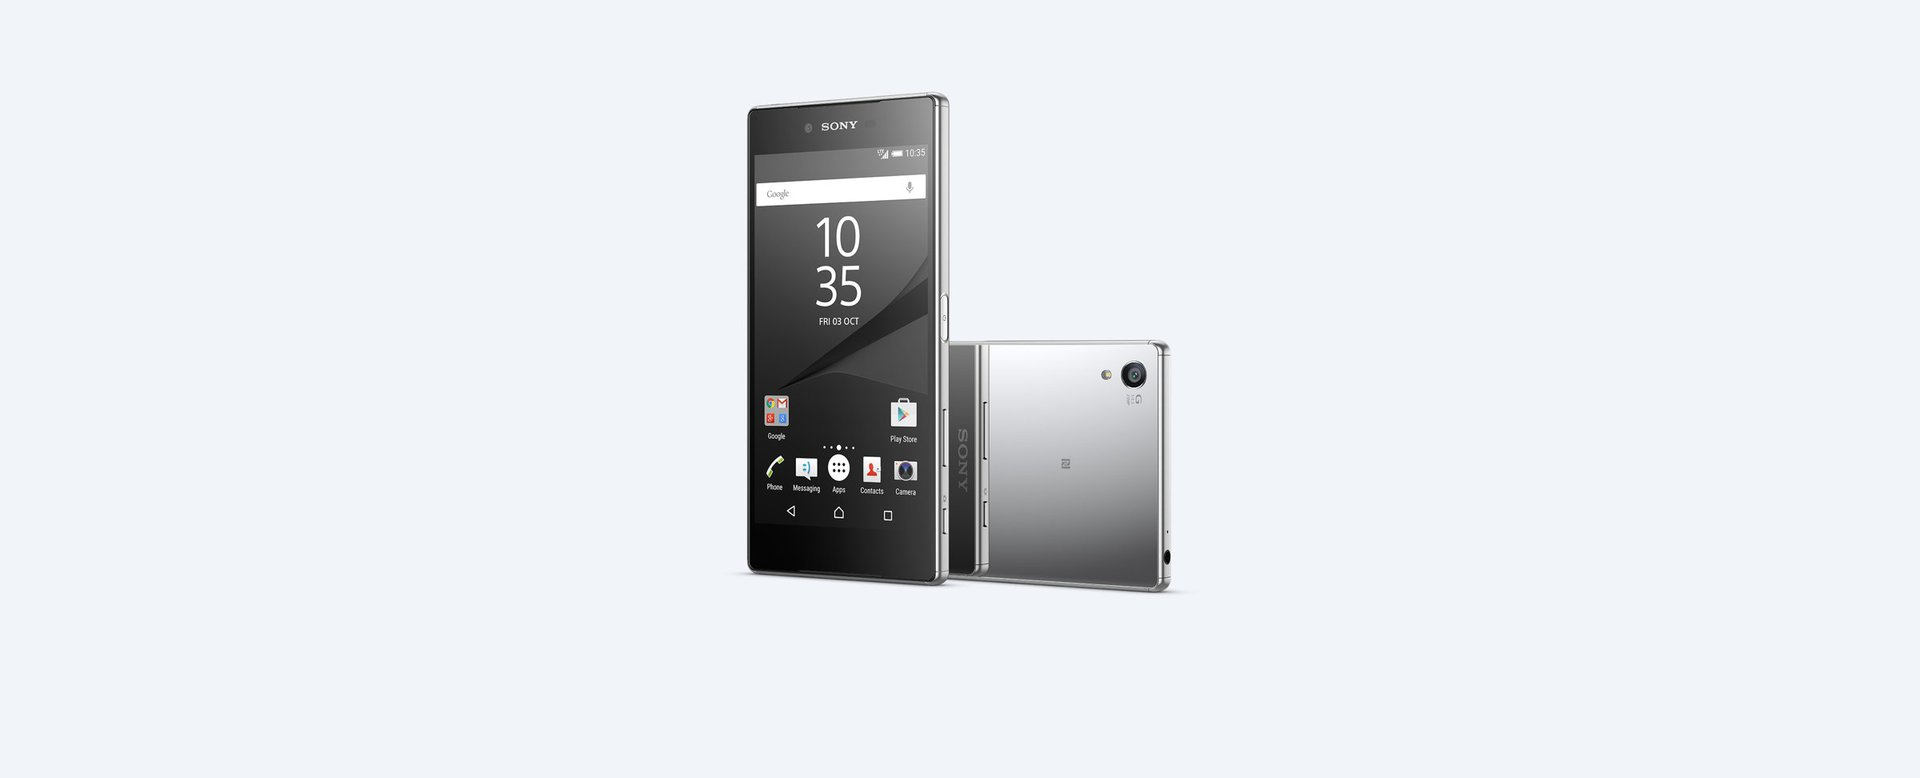 Xperia Z5, Z5 Compact и Z5 Premium. Первые подробности - 4